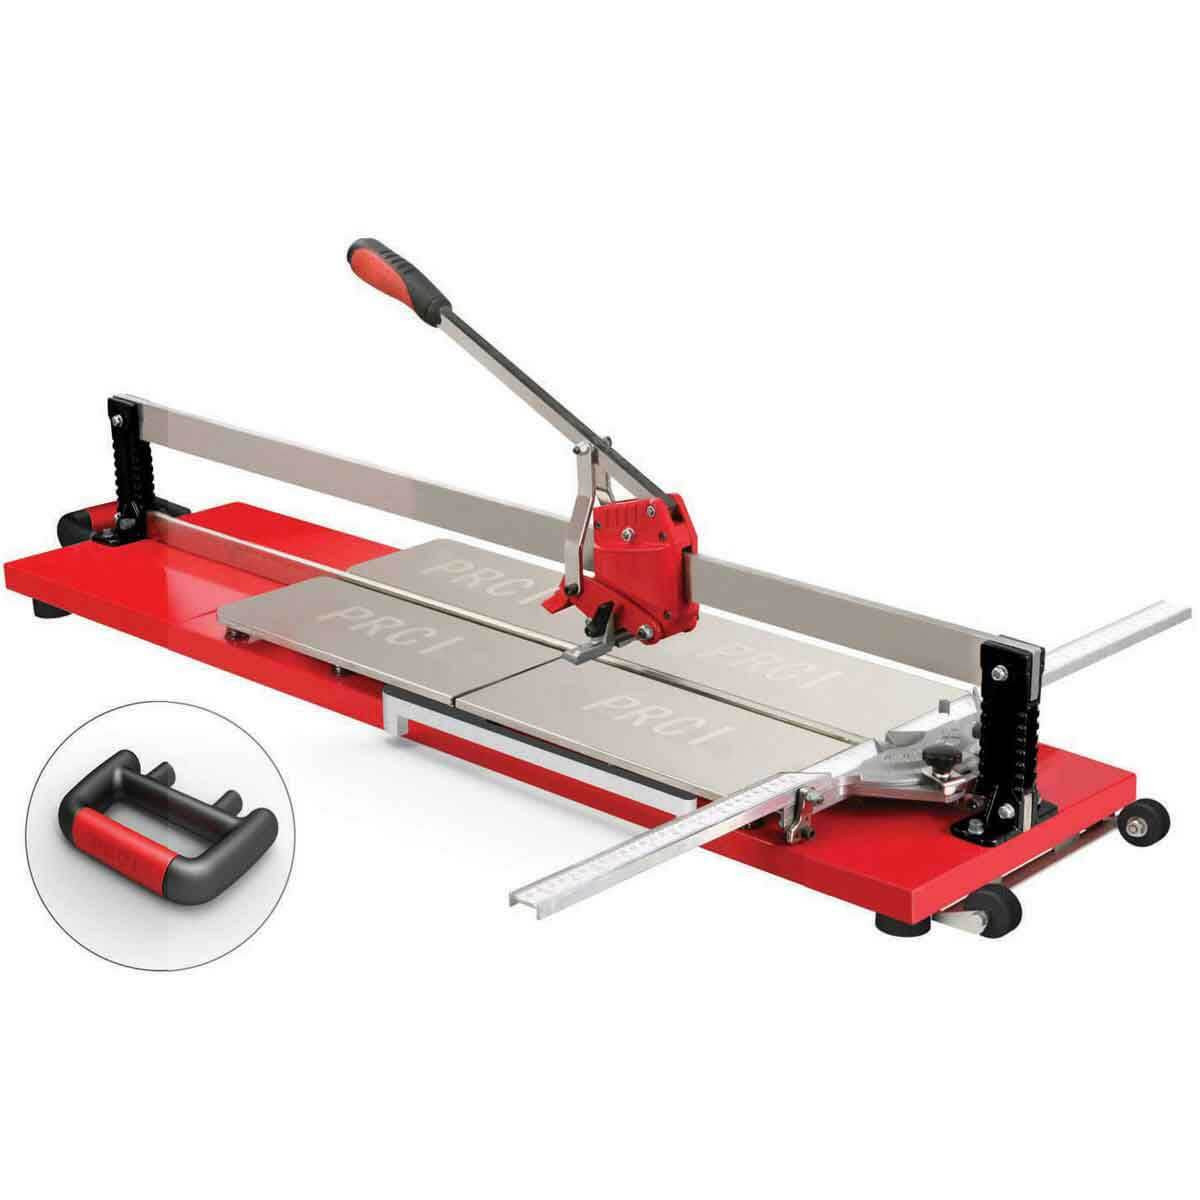 Tomecanic UltraPro Tile Cutter